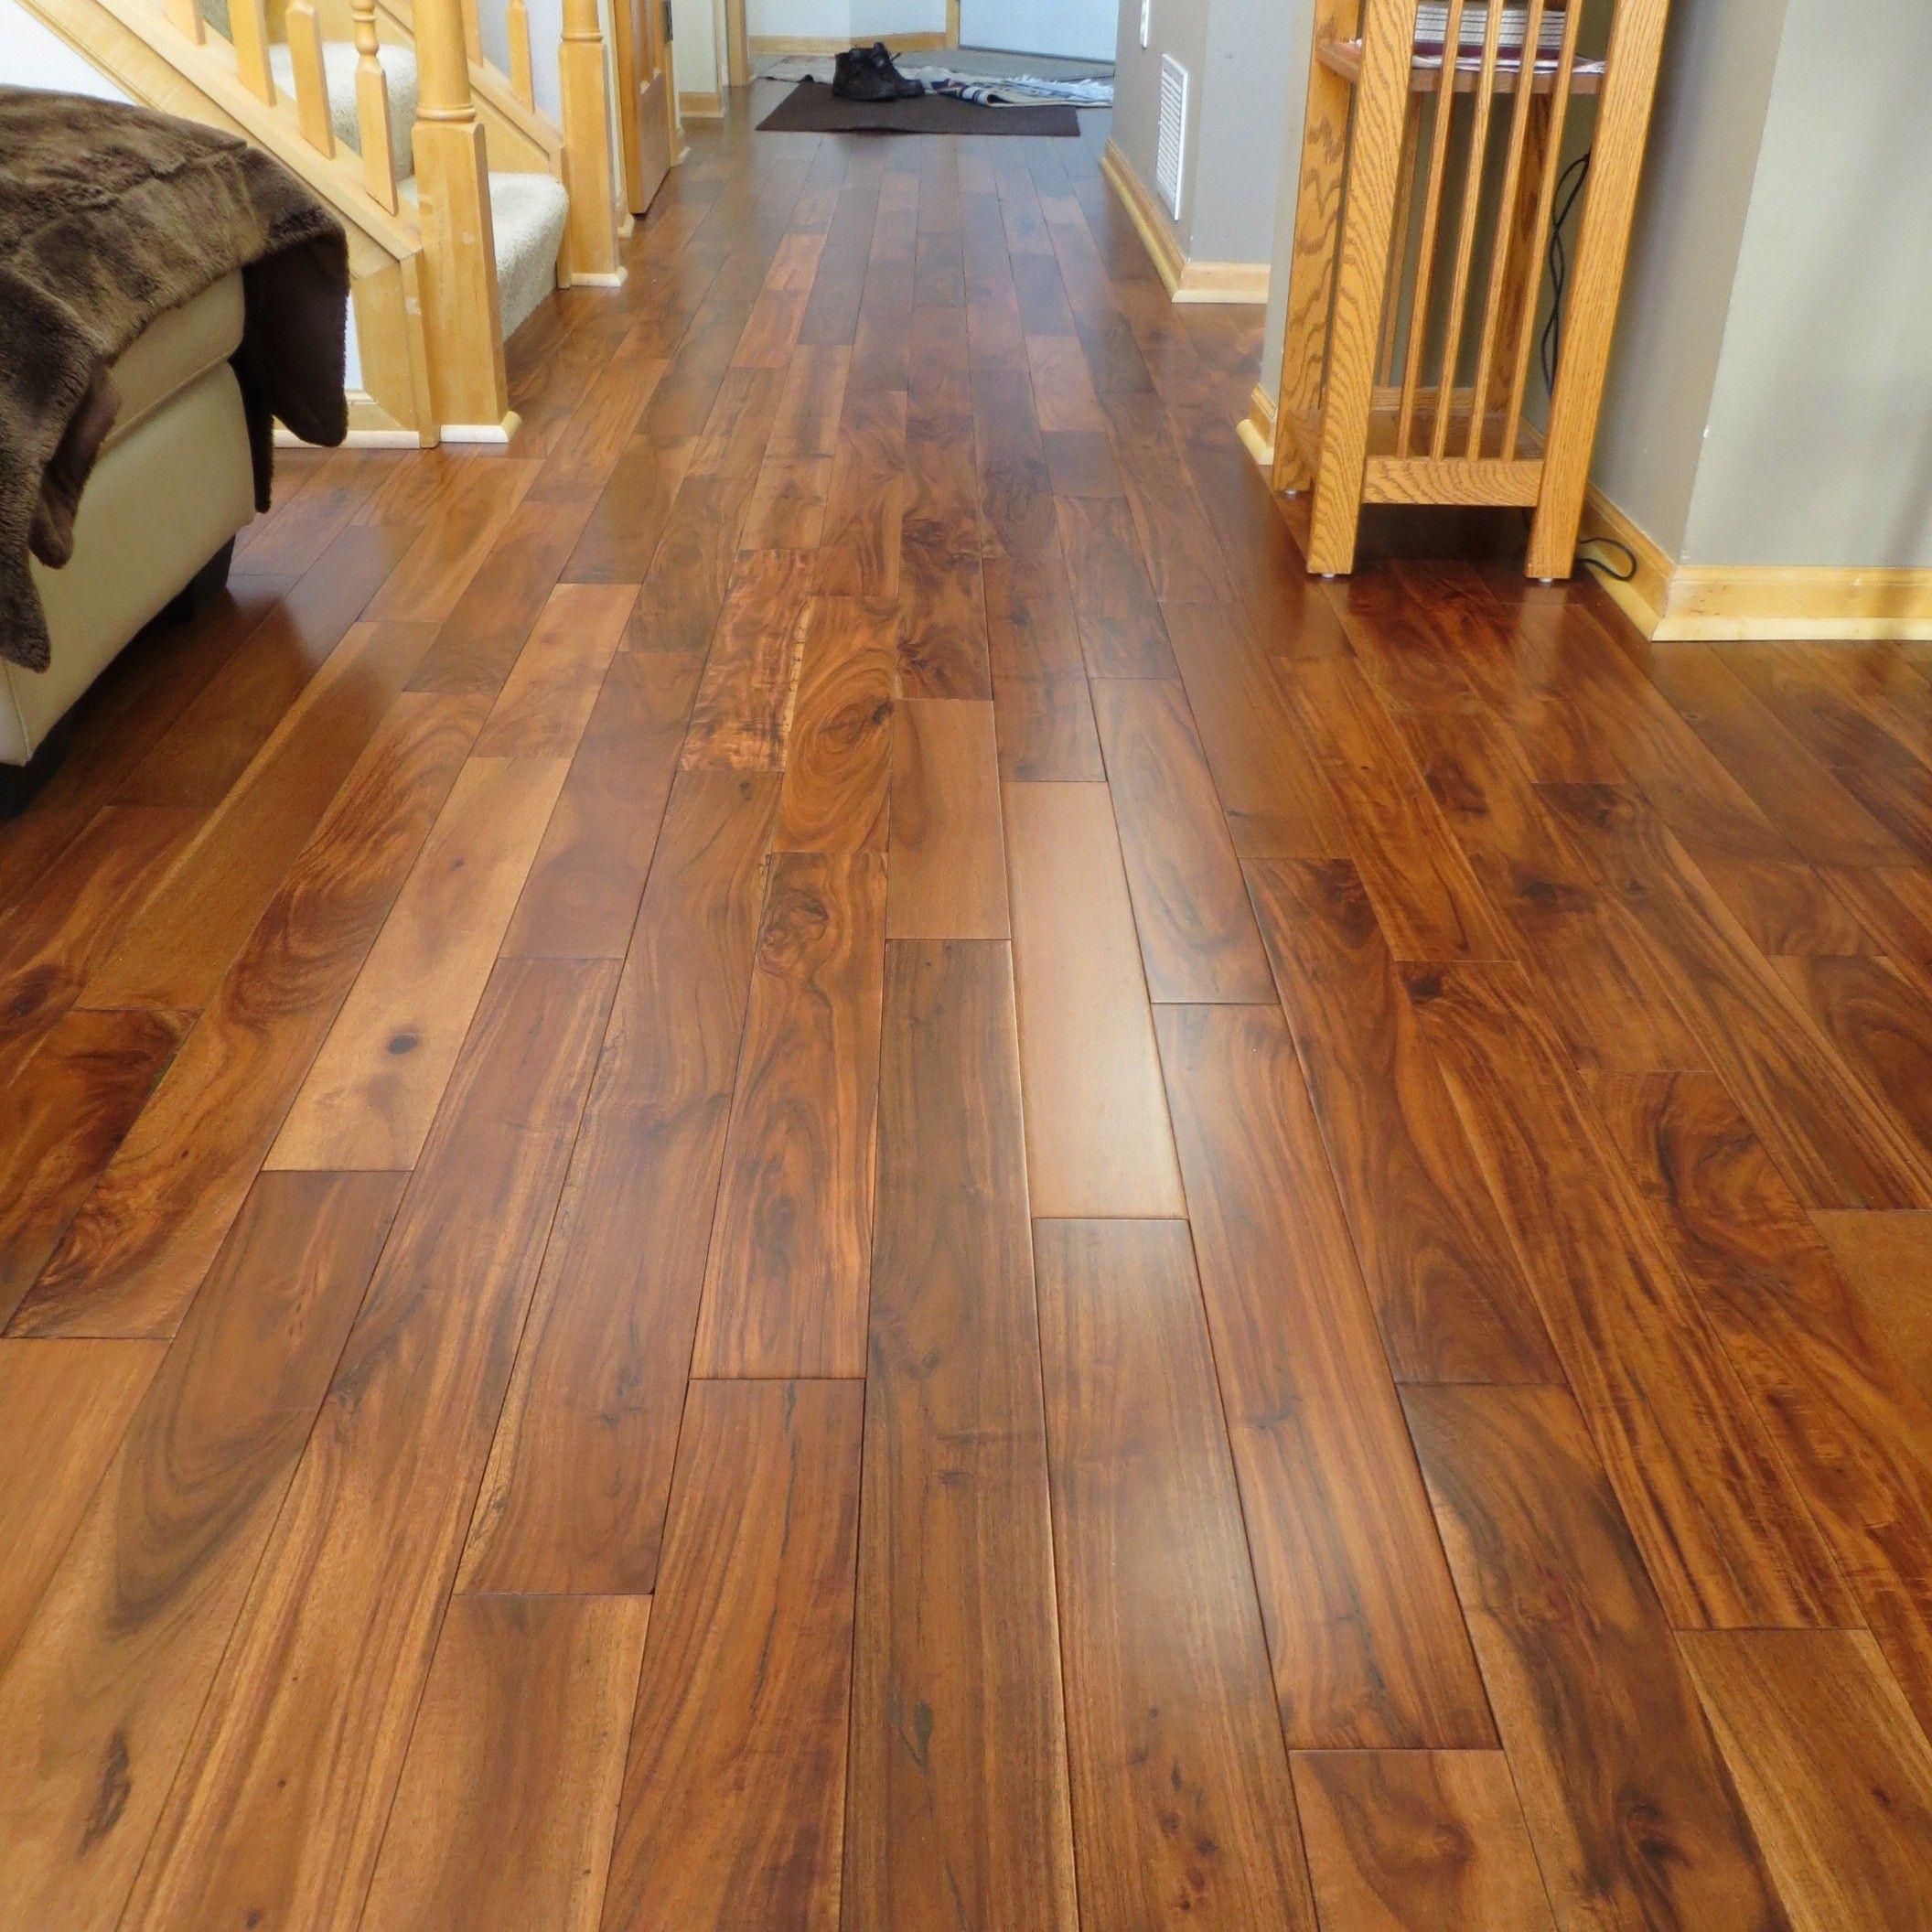 acacia hardwood flooring for sale of acacia wood flooring laminate wood flooring lowes laminate flooring inside acacia wood flooring acacia bronze plank pinterest